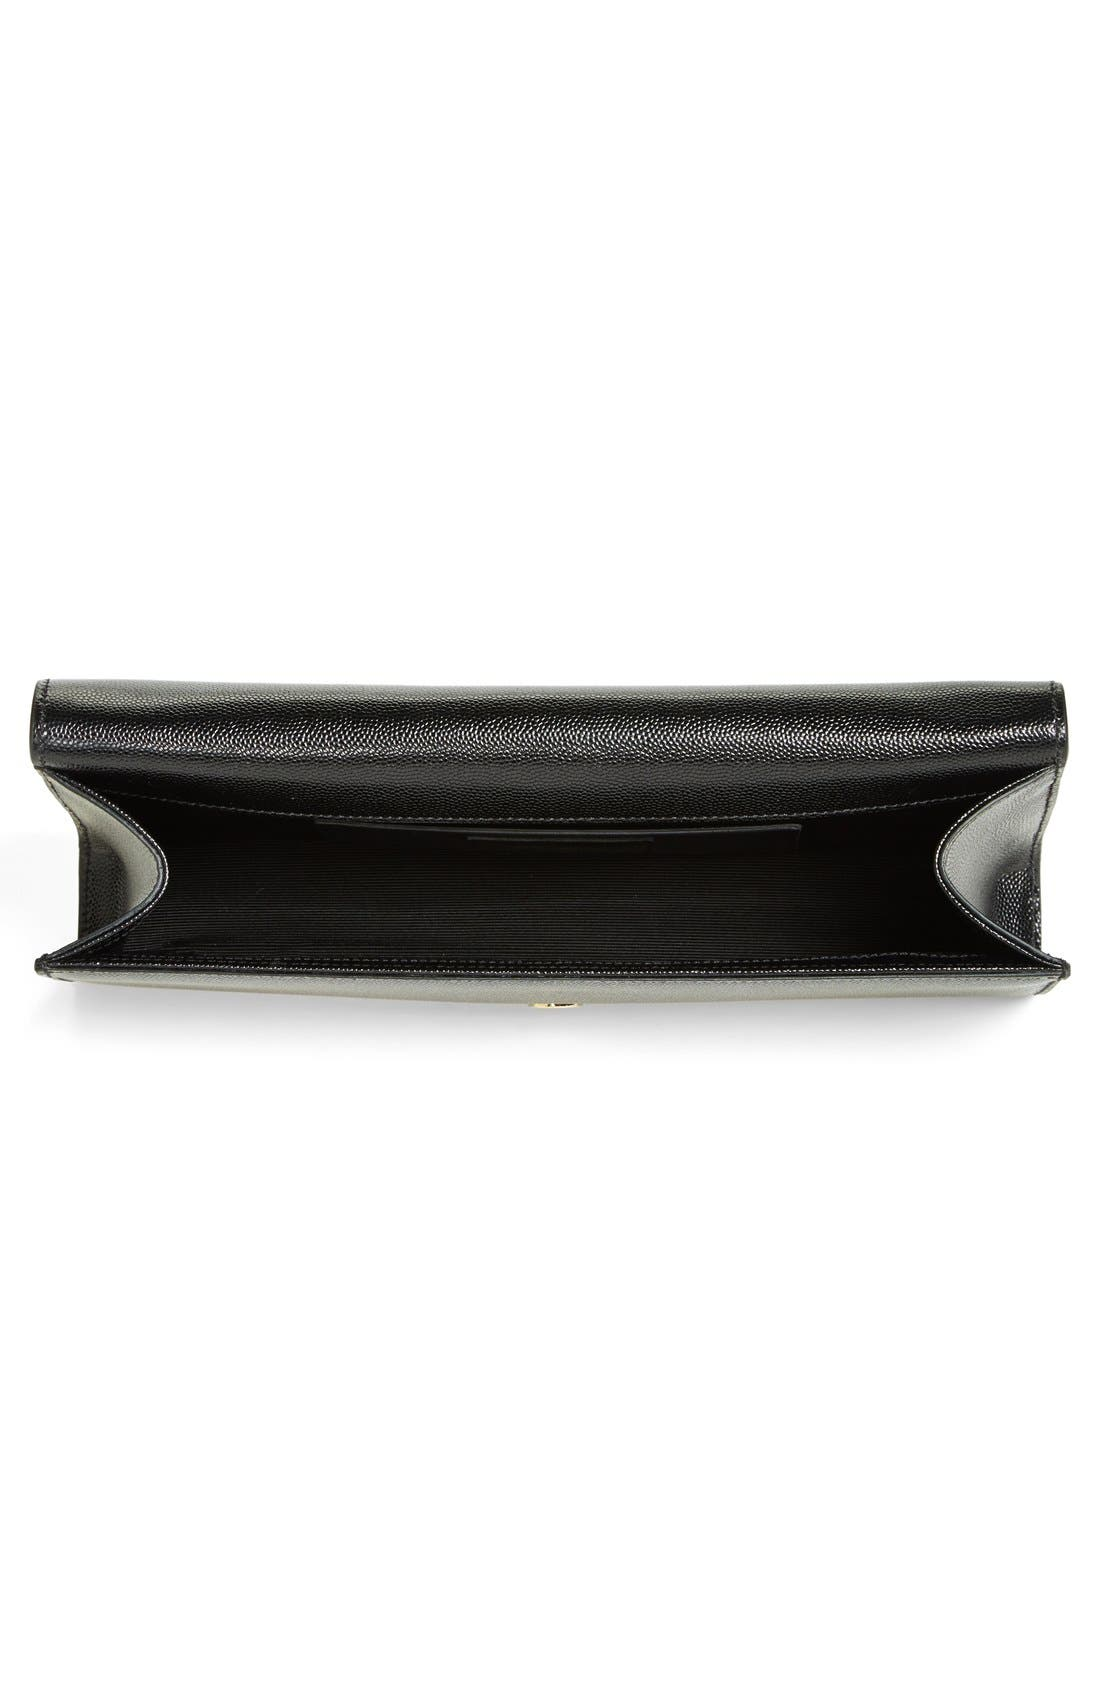 Alternate Image 4  - Saint Laurent 'Monogram' Leather Clutch